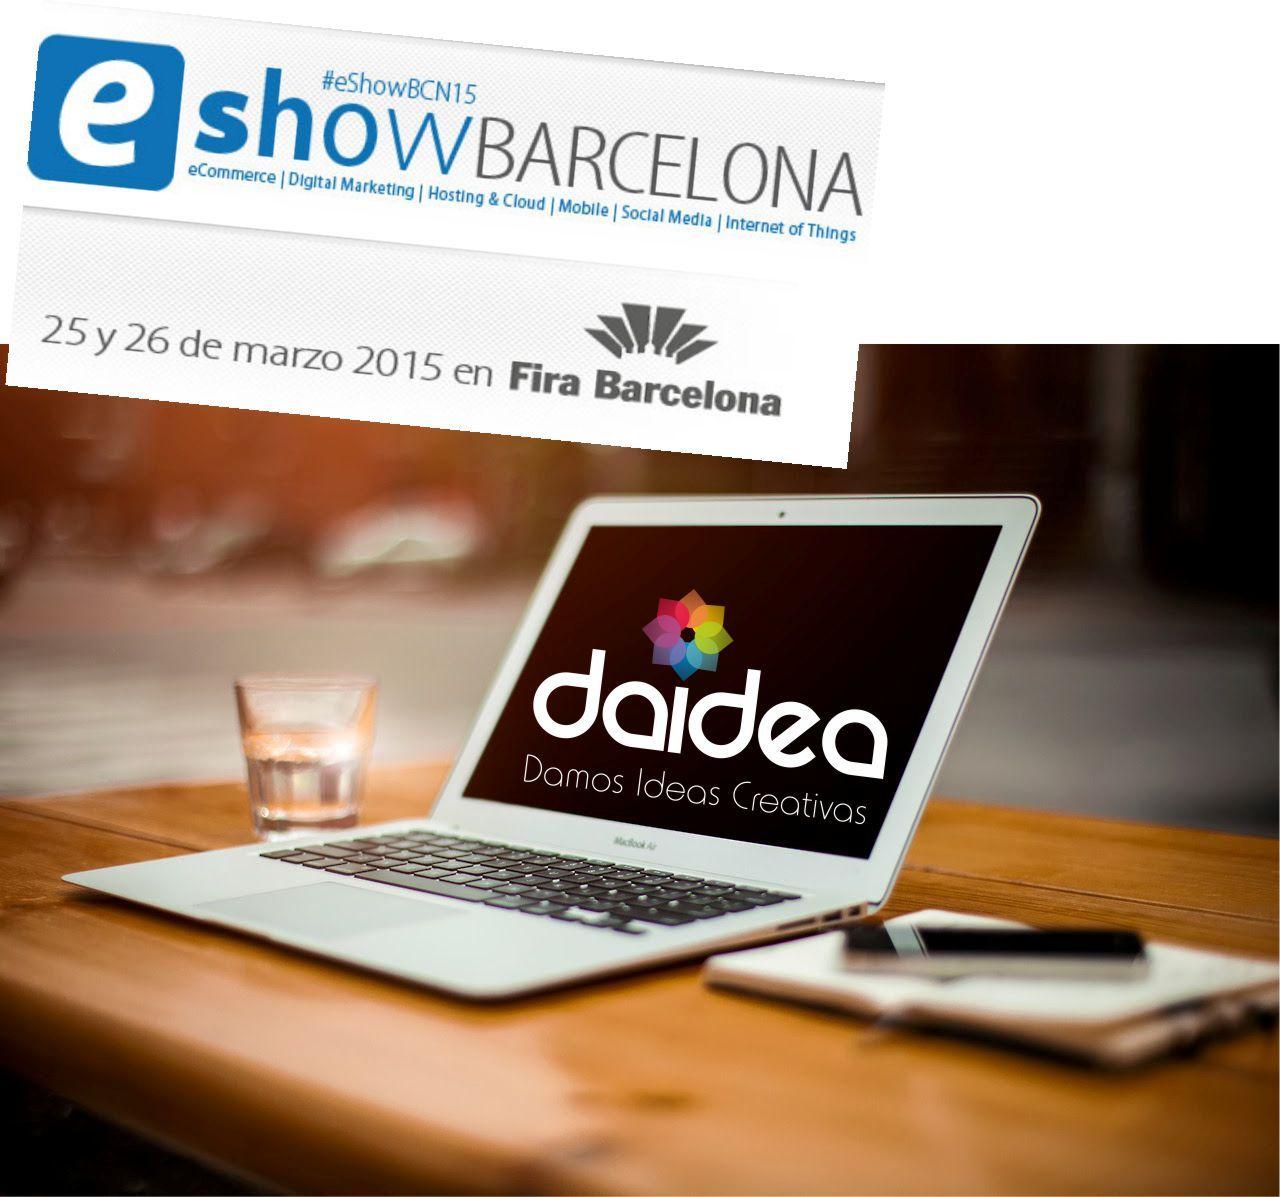 eSHOW Barcelona 2015, la cita internacional de Marketing Online